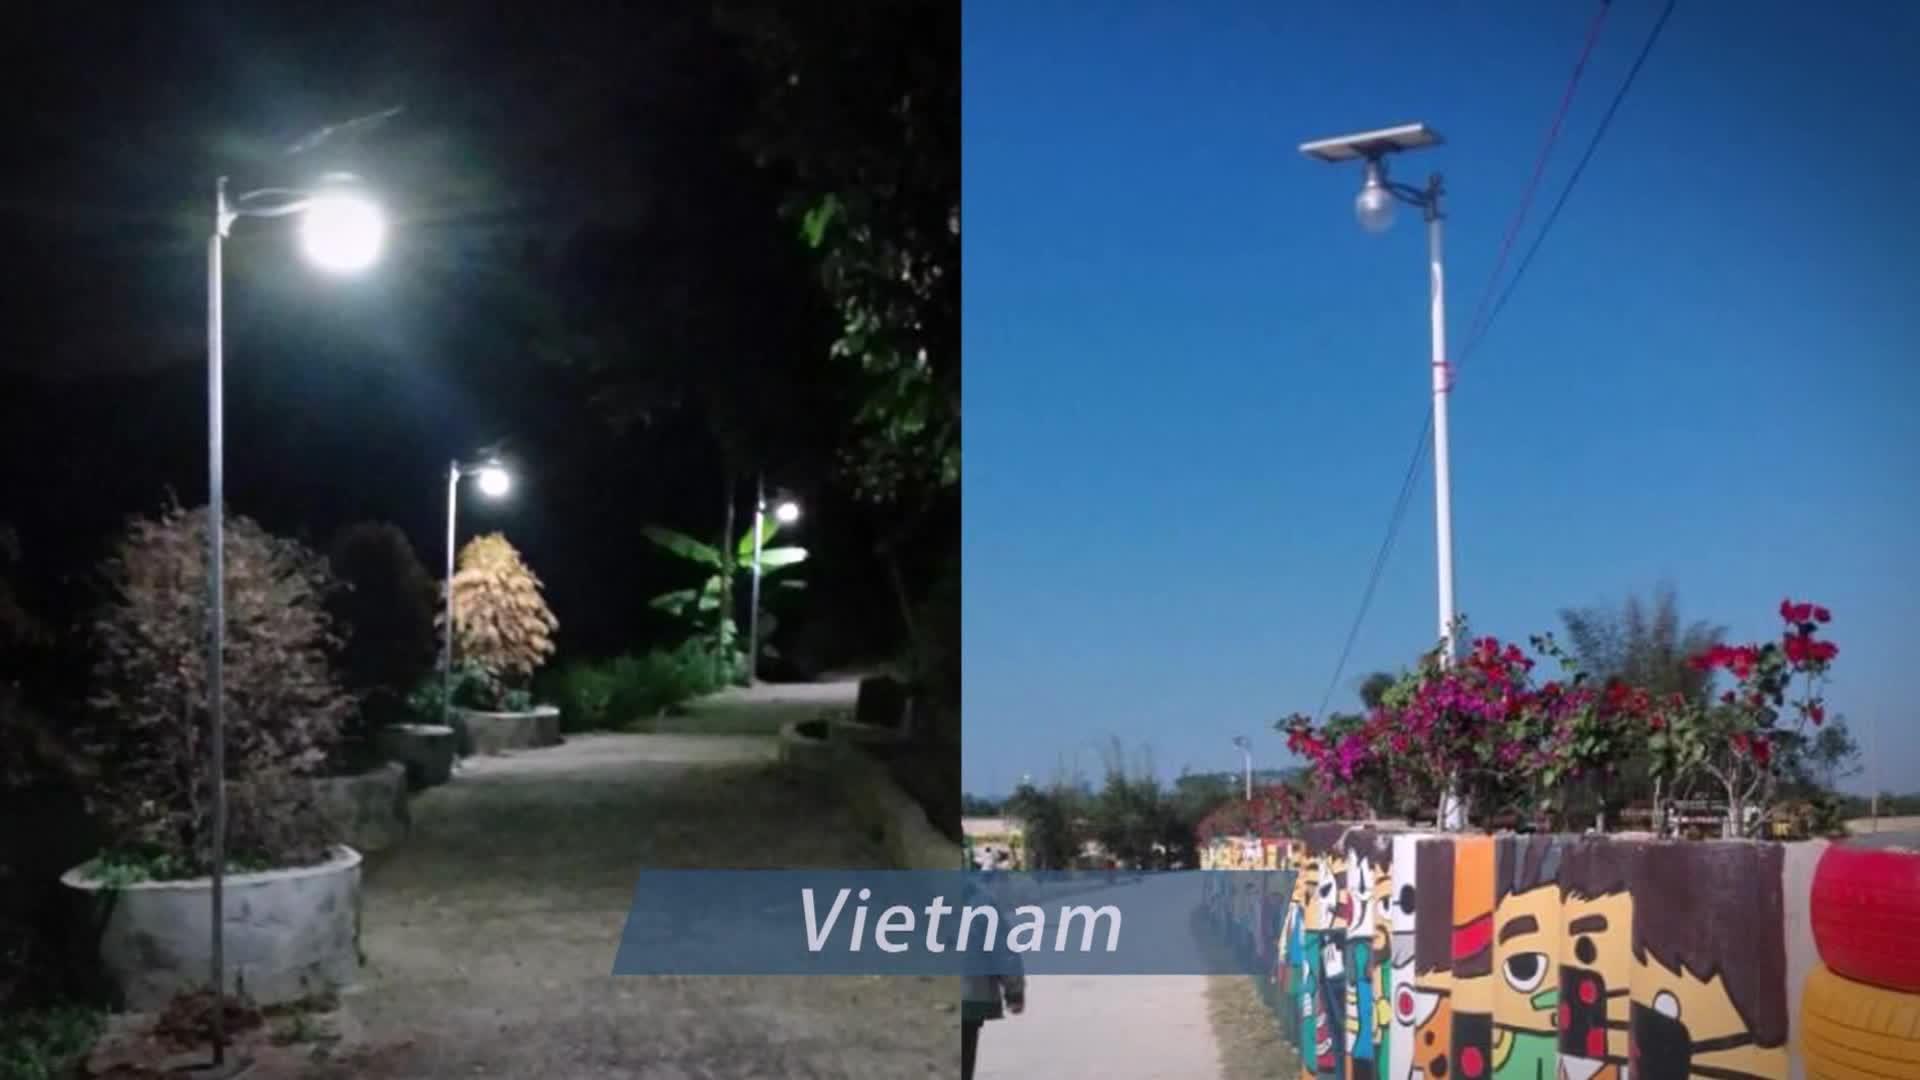 3.2V IP65 waterproof 2w 3w 4w decorative solar outdoor fence post light solar led garden pillar light outdoor